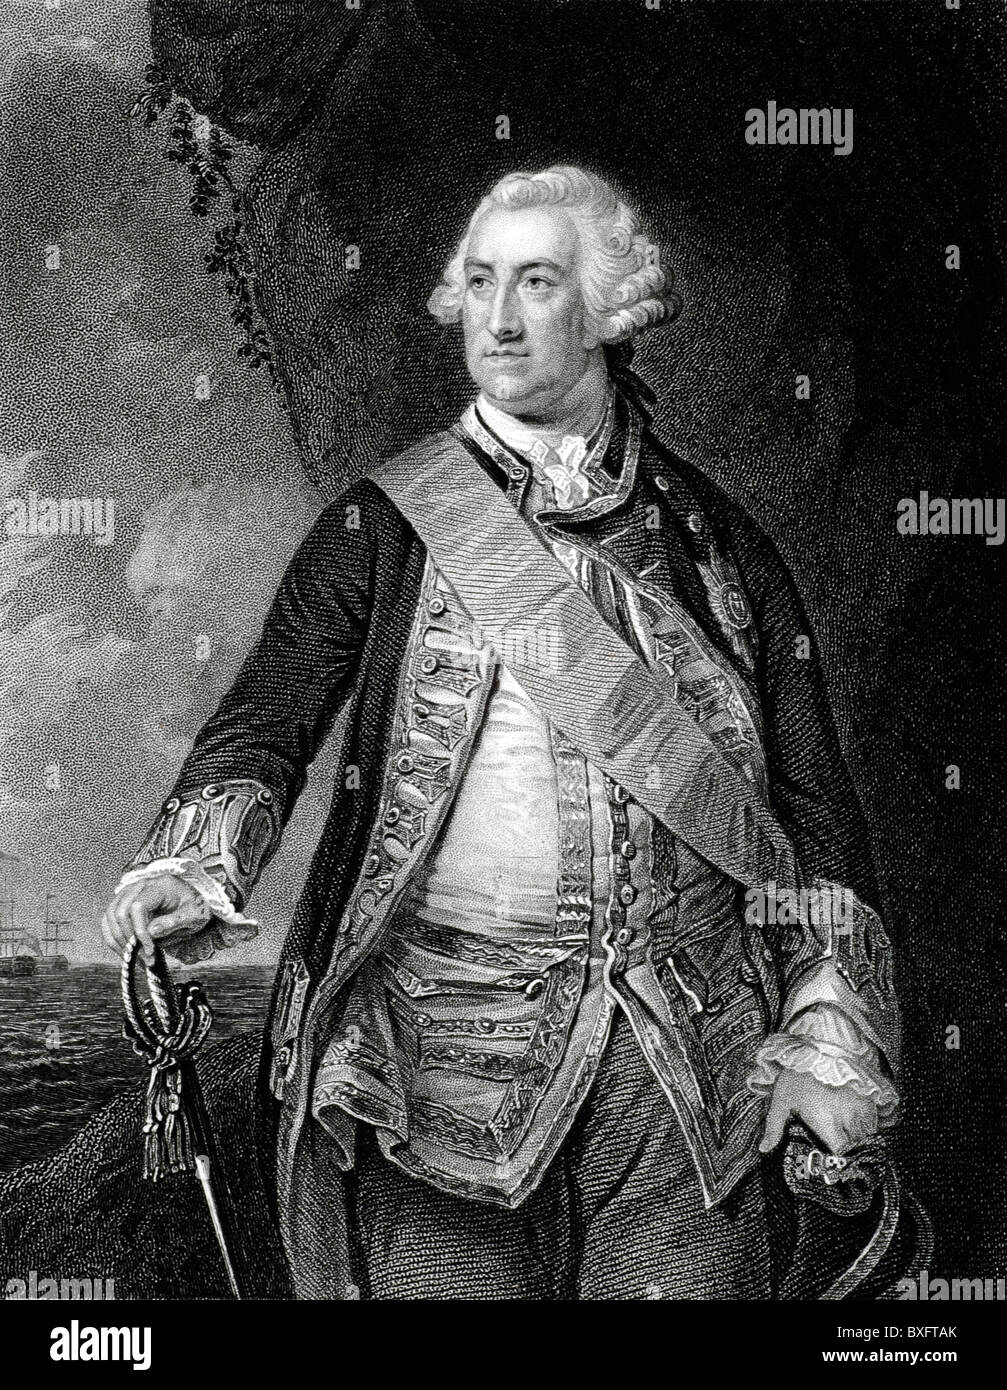 Admiral Edward Hawke (1705-1781), 1st Baron Hawke, British Naval or